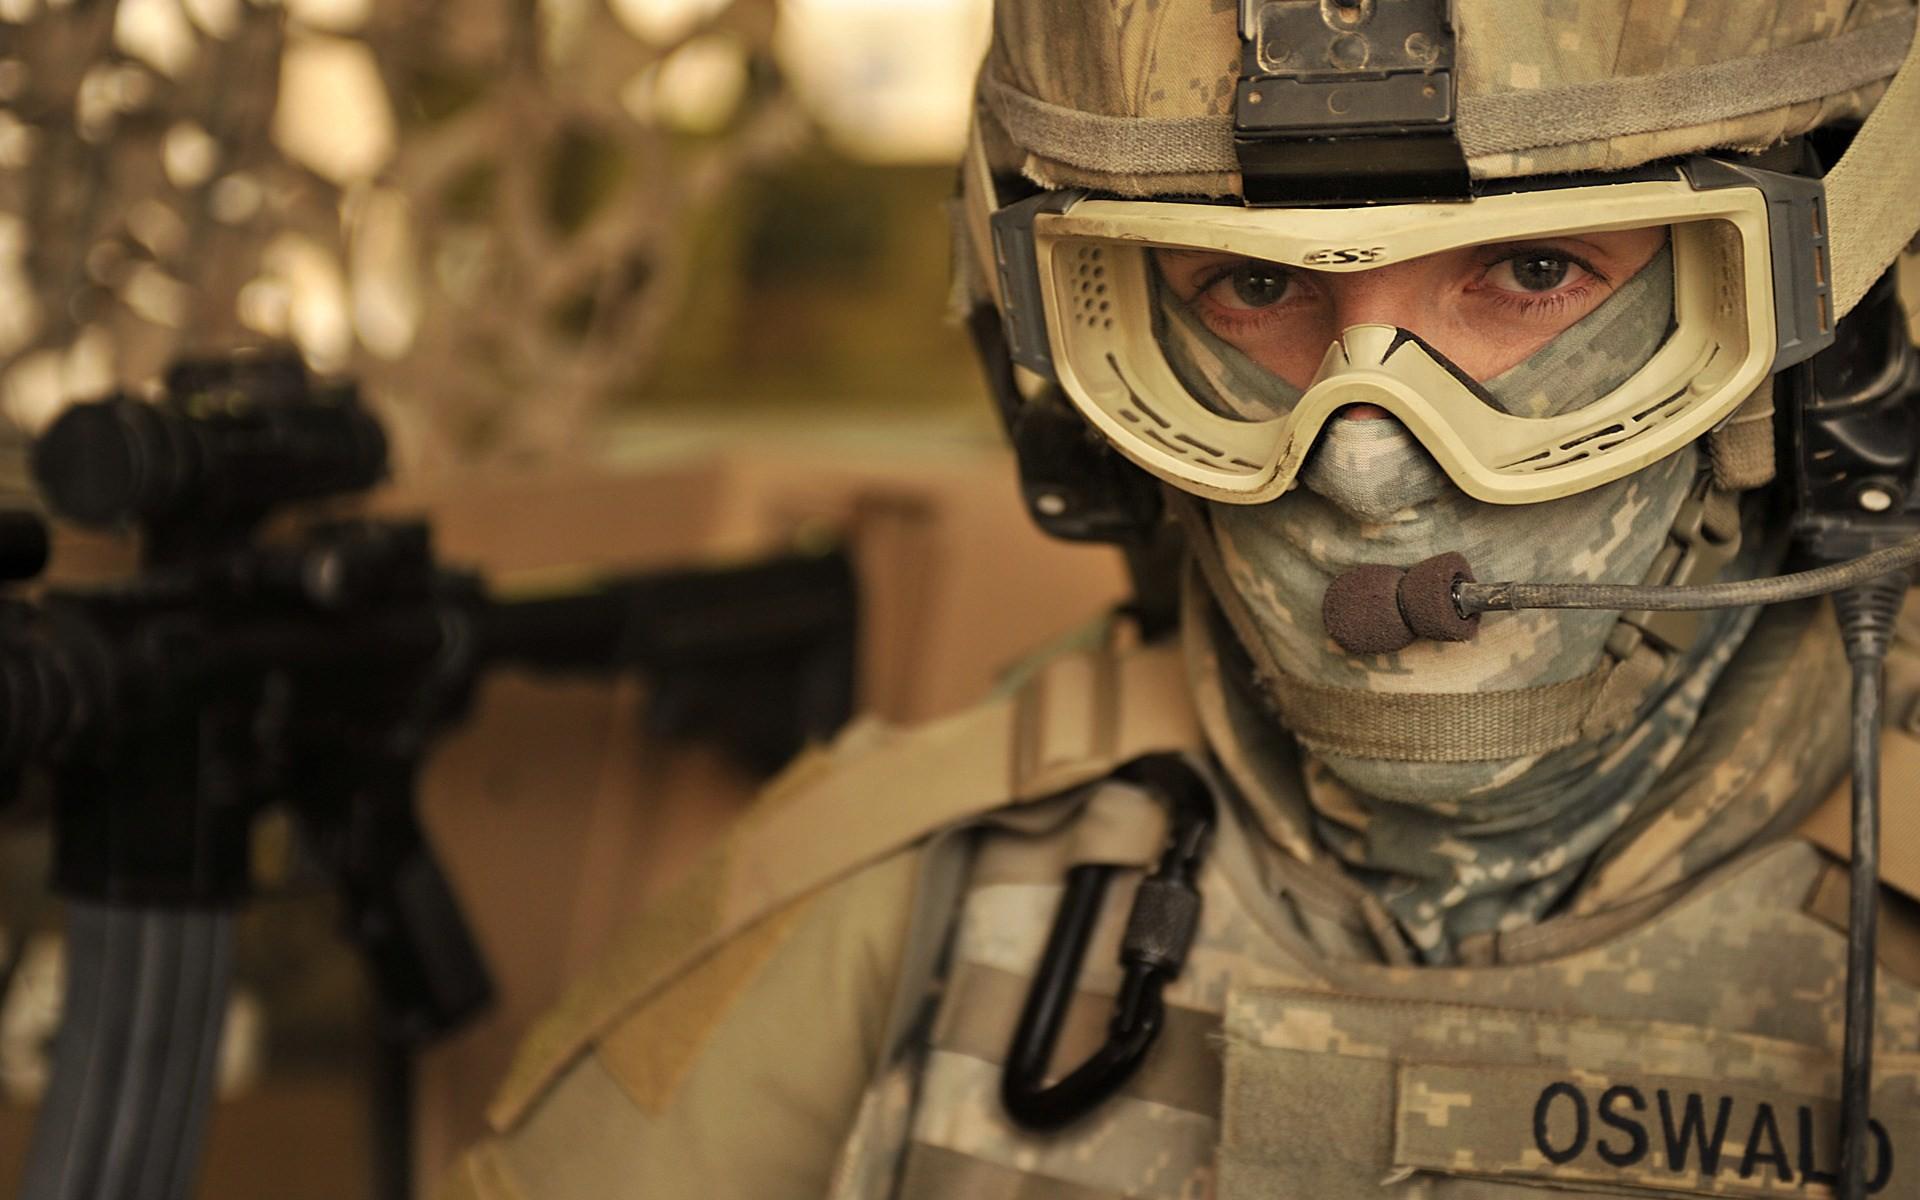 Portrait Soldier Military Wallpaper